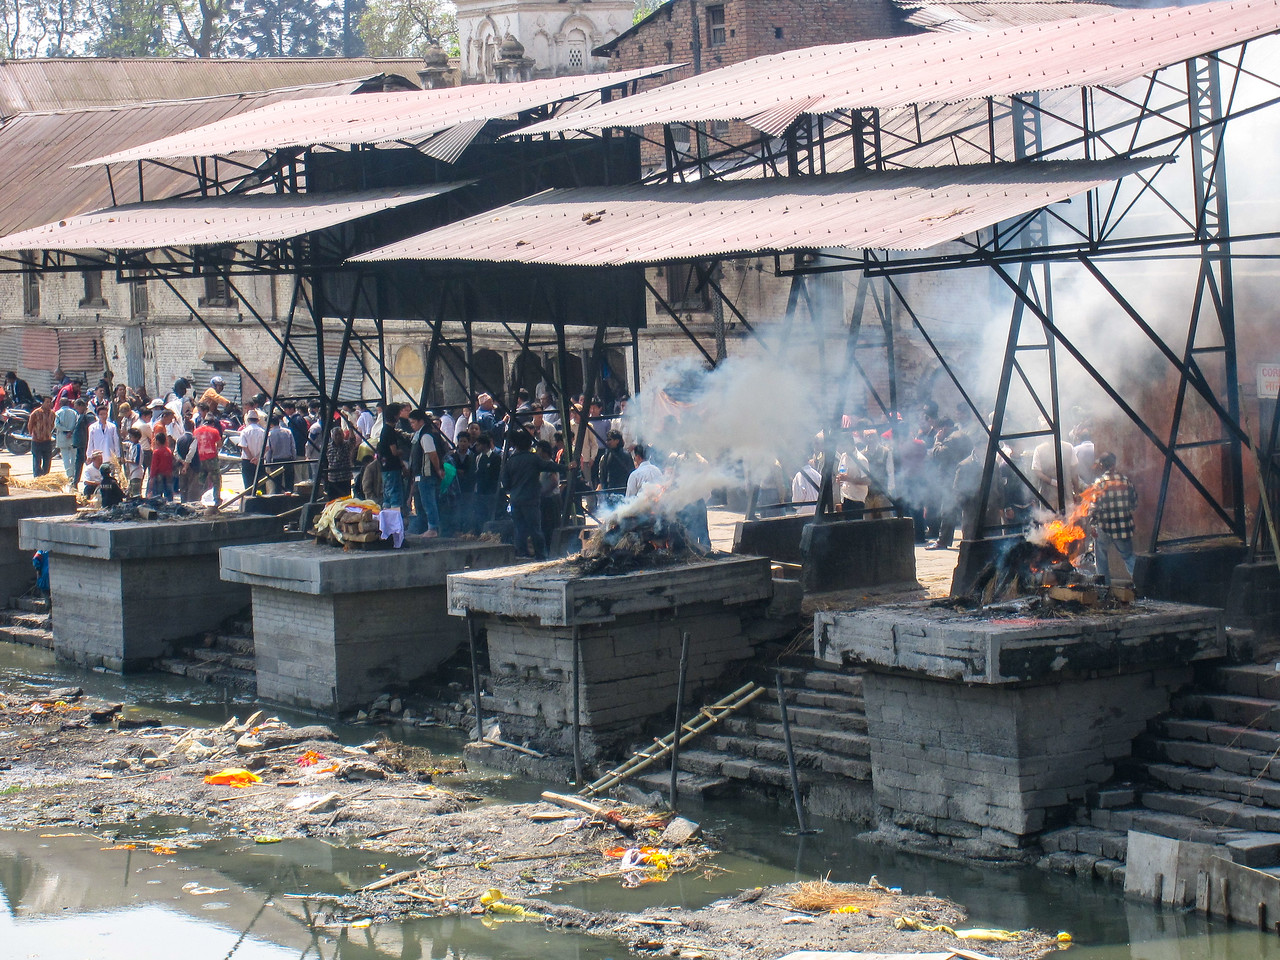 Holy ghats burn at Kathmandu's Pashupatinath Temple